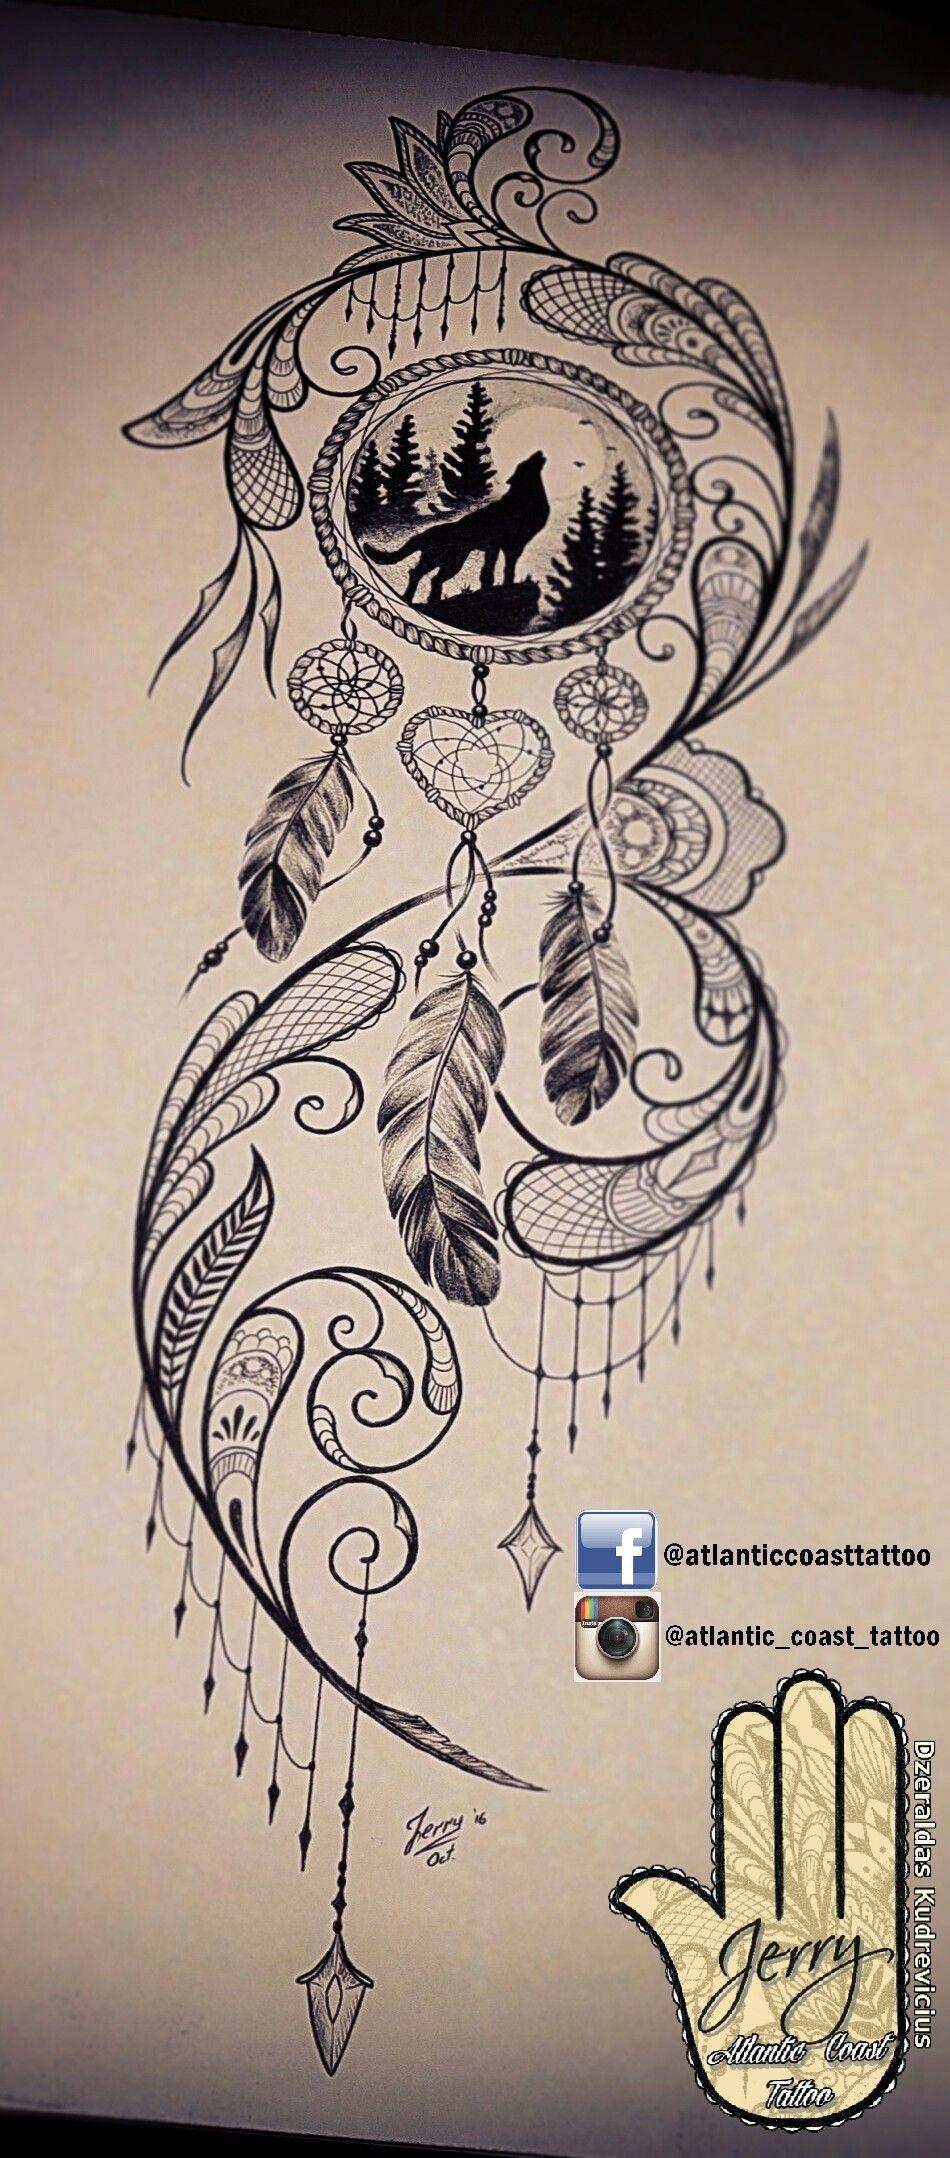 Beautiful Tattoo Idea Design For A Thigh Dream Catcher Tattoo Wolf Tattoo Ideas By Dzeraldas Feather Tattoos Dream Catcher Tattoo Design Lace Tattoo Design